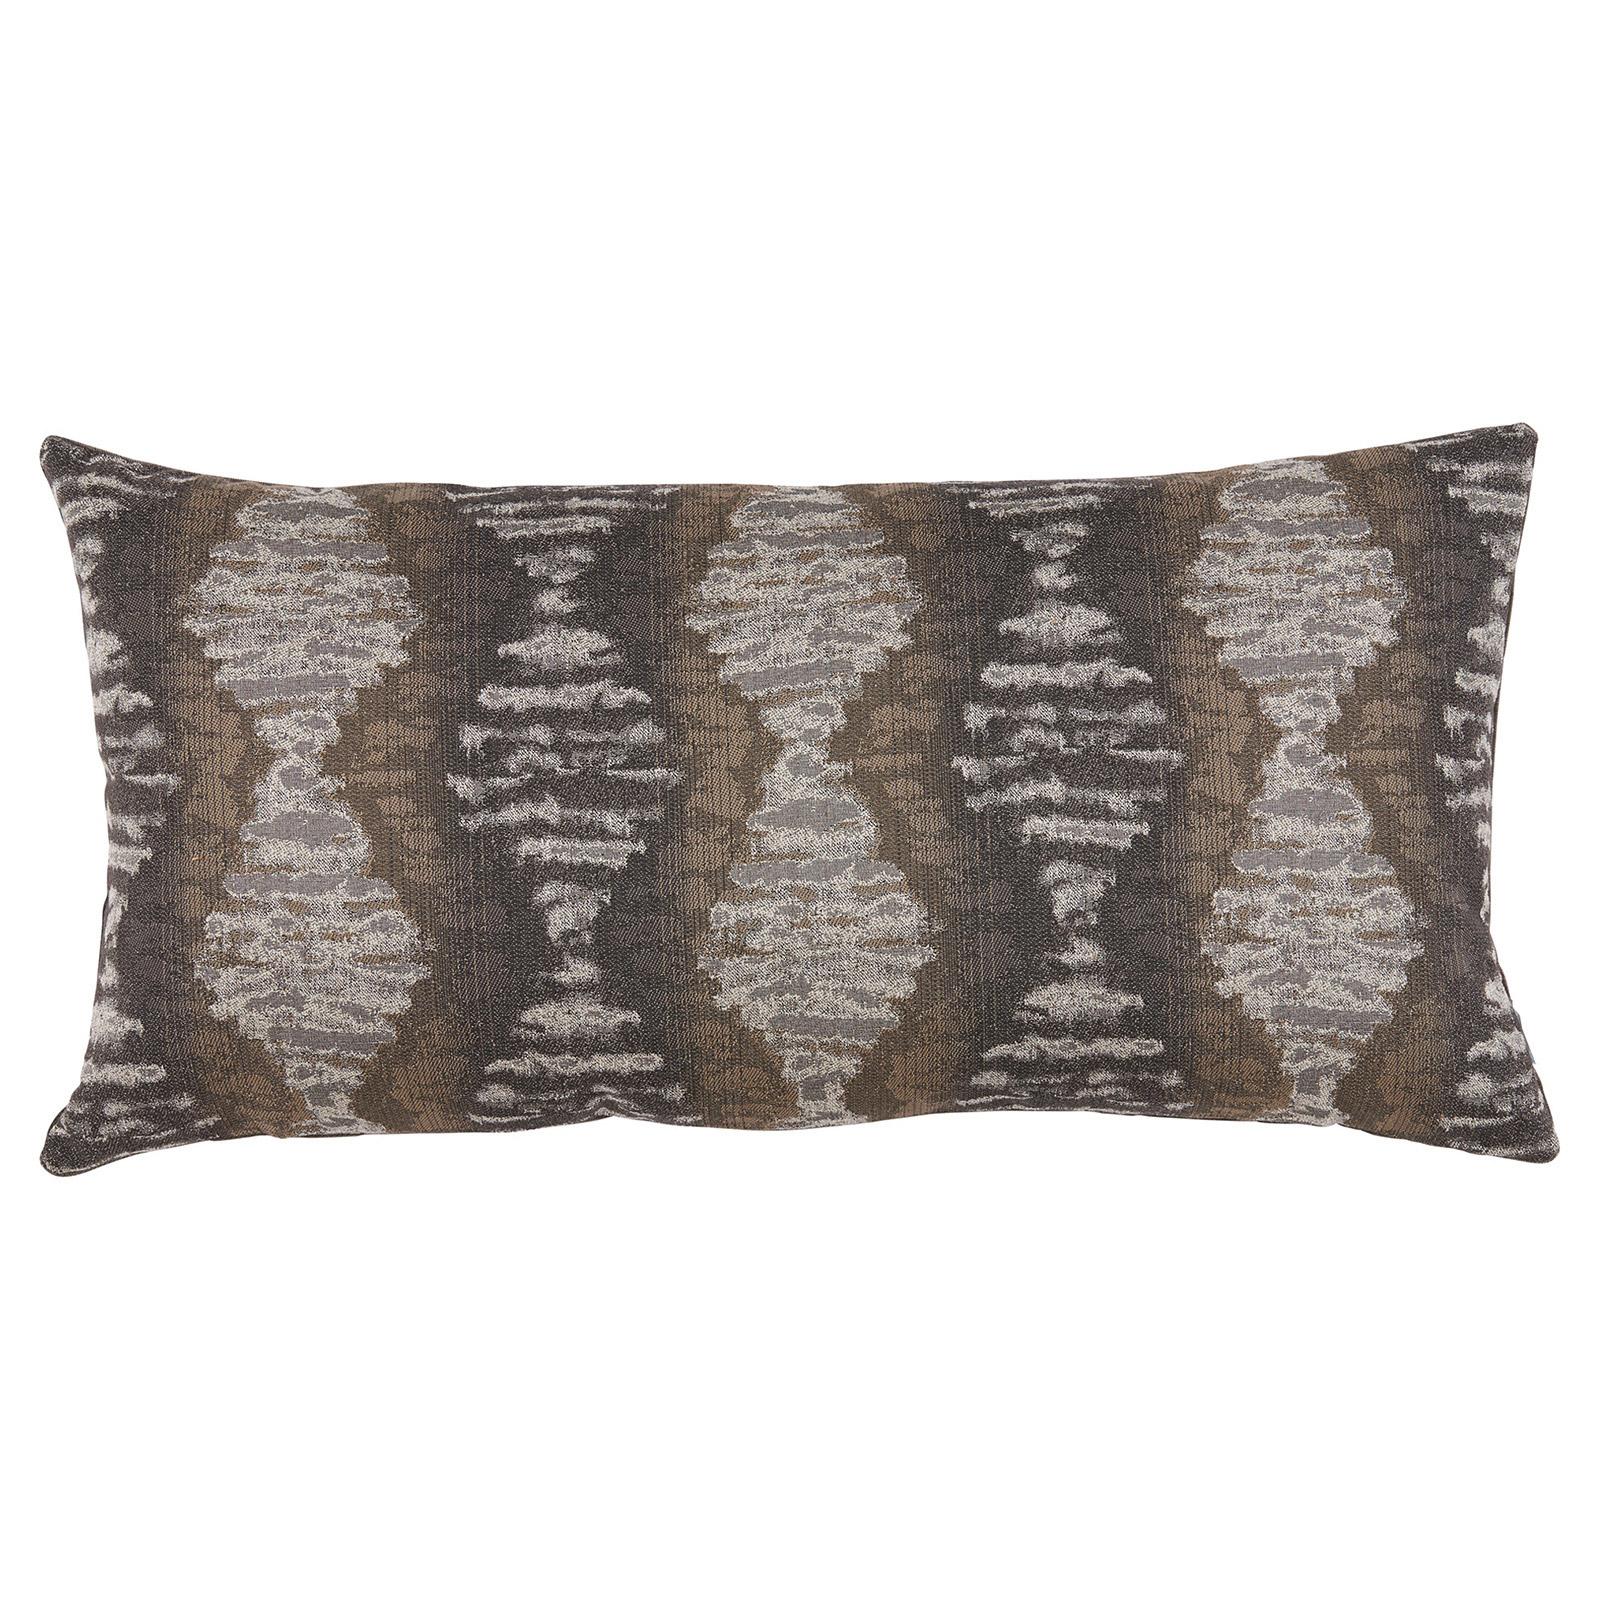 Marnie Global Distressed Diamond Charcoal Grey Pillow - 14x28